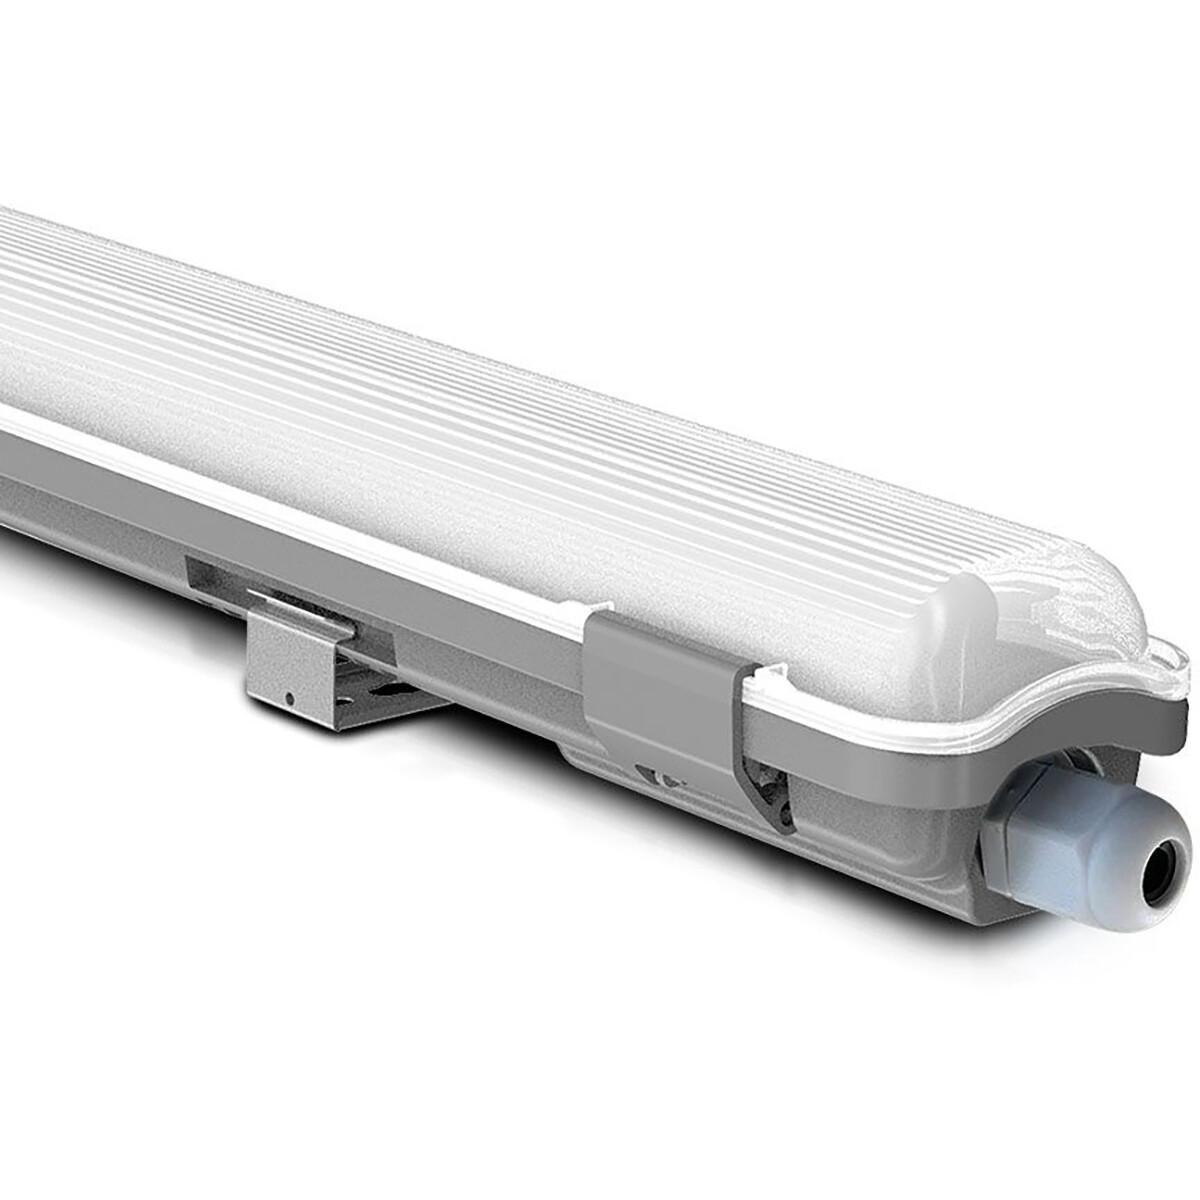 LED TL Armatuur met T8 Buizen - Viron Truno - 60cm Dubbel - 20W - Helder/Koud Wit 6400K - Mat Wit - Kunststof